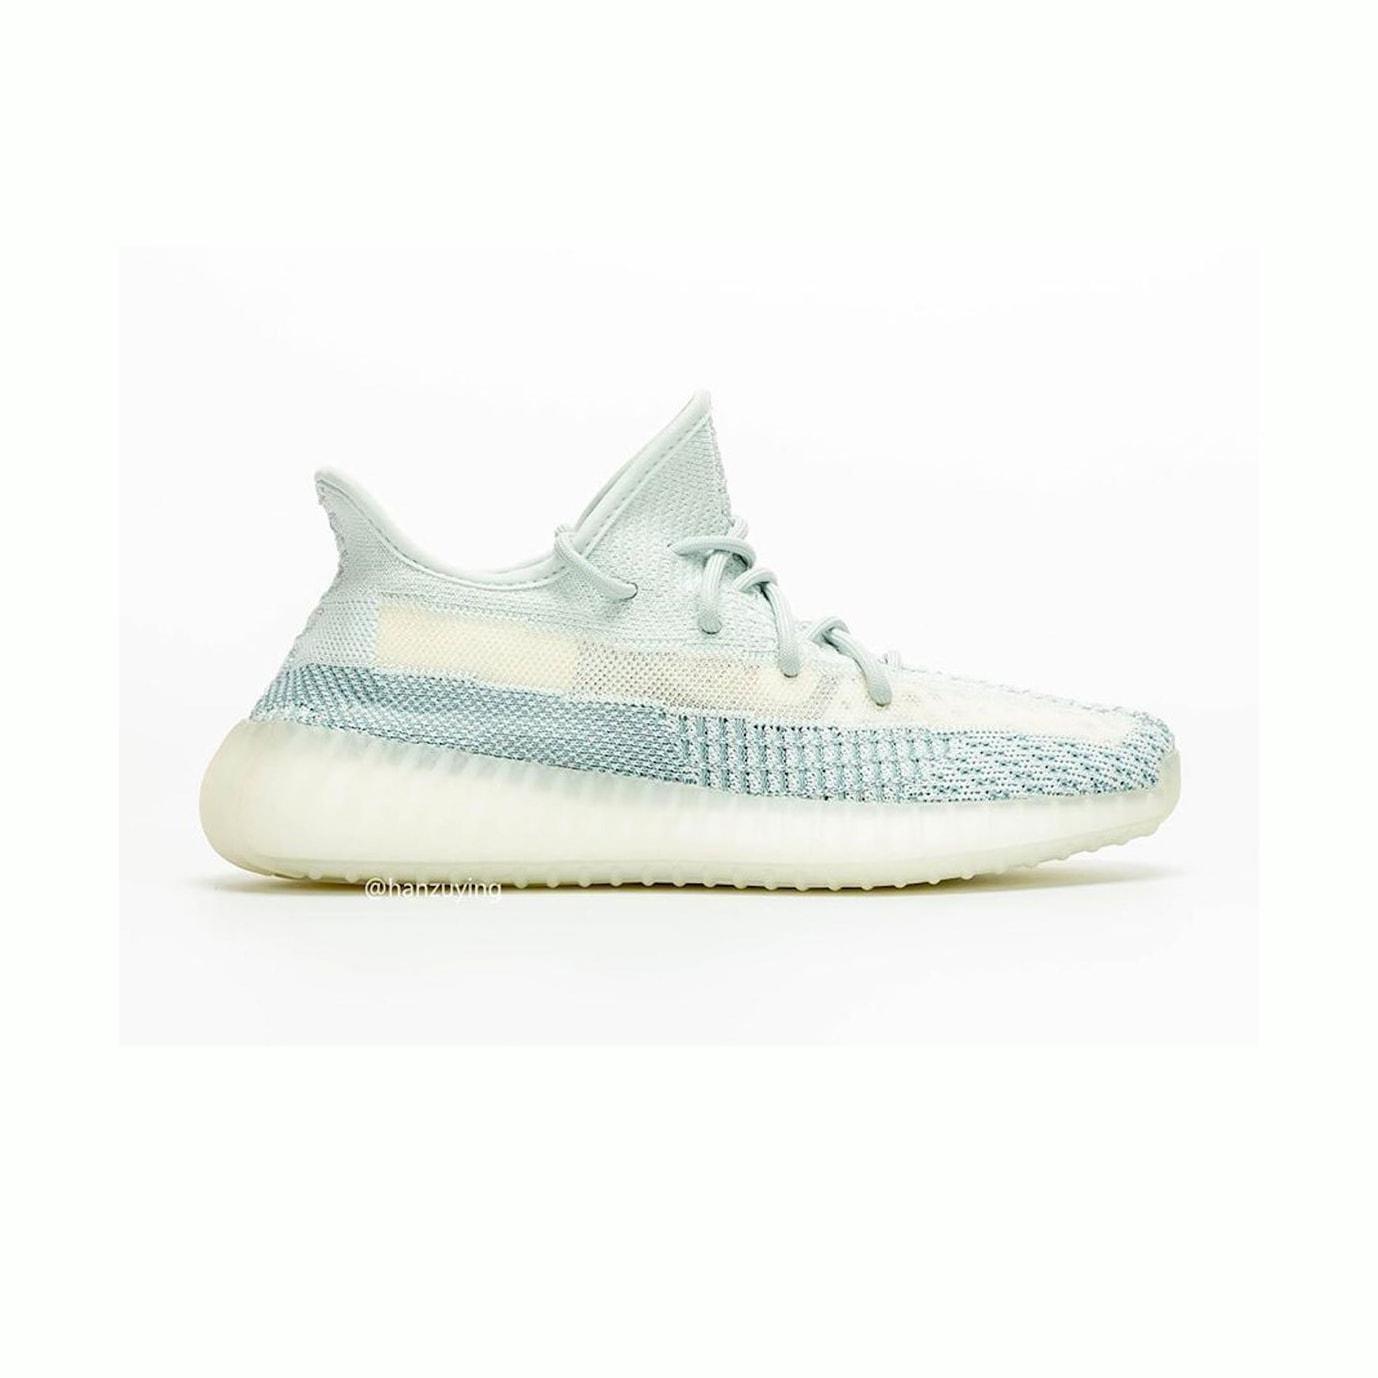 adidas Yeezy 350 V2 Cloud White Store